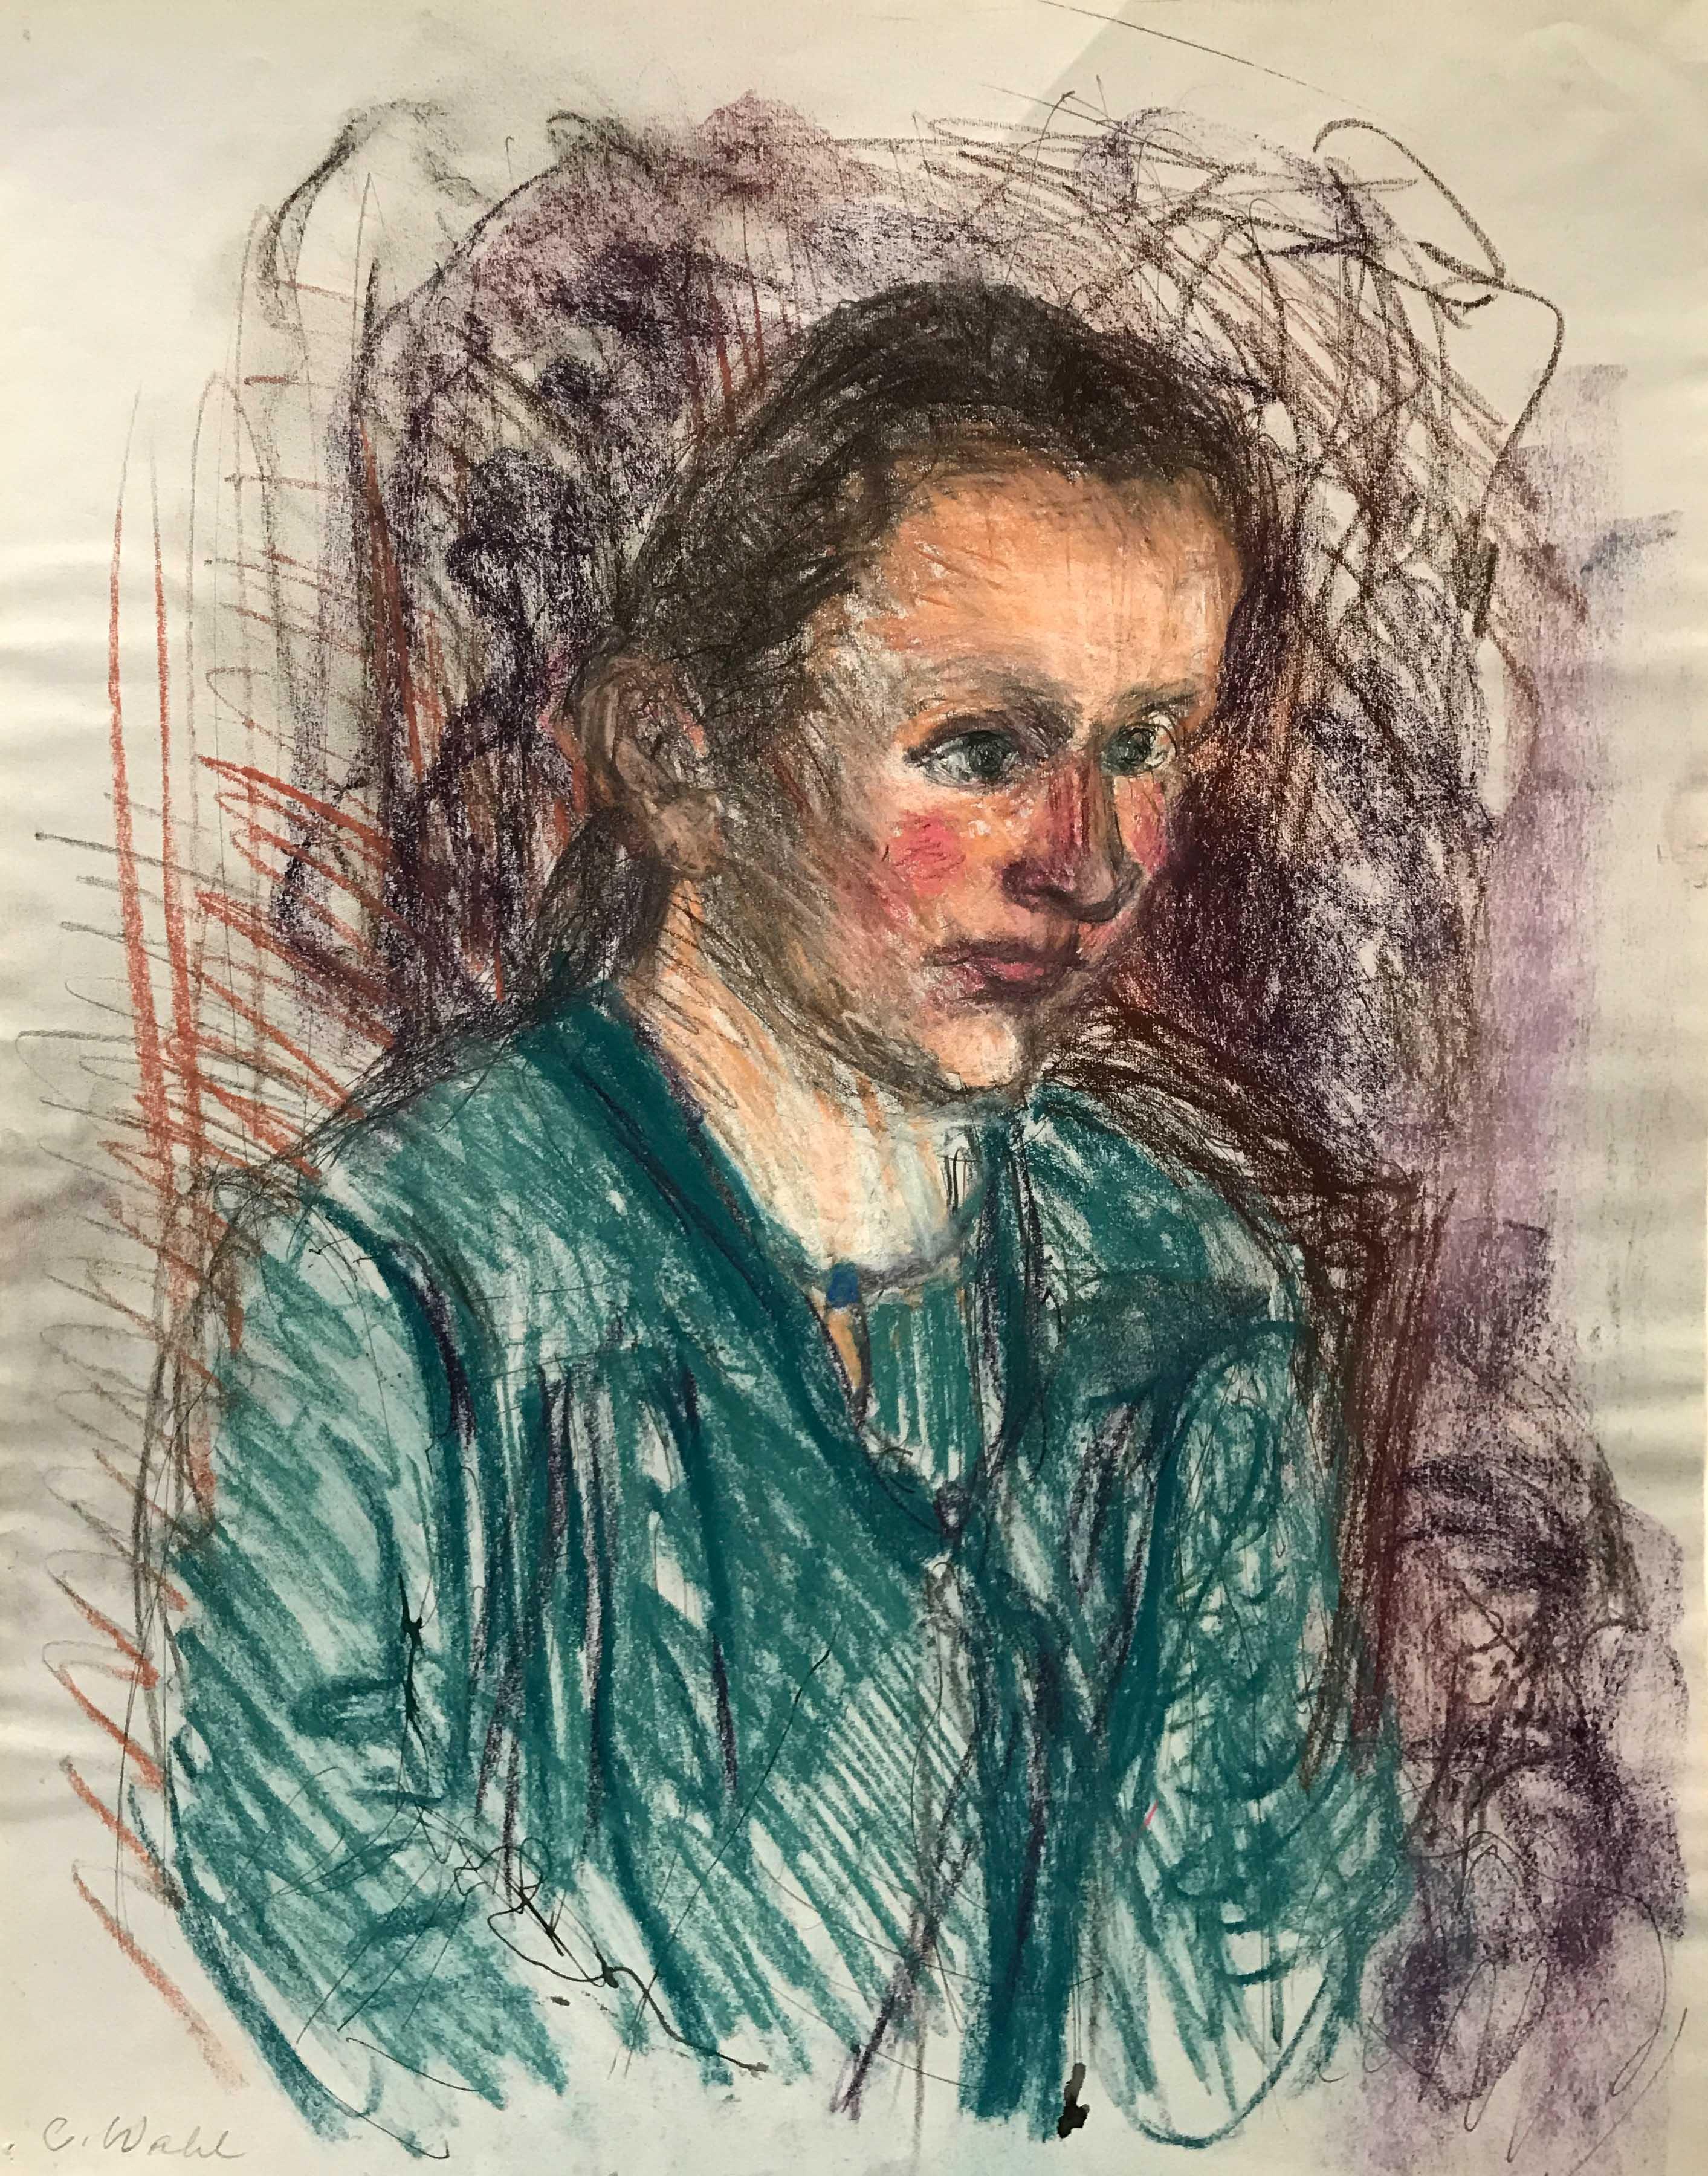 Christine Wahl, Porträt Ulrike, um 1985, Pastell, 49 x 39,5 cm